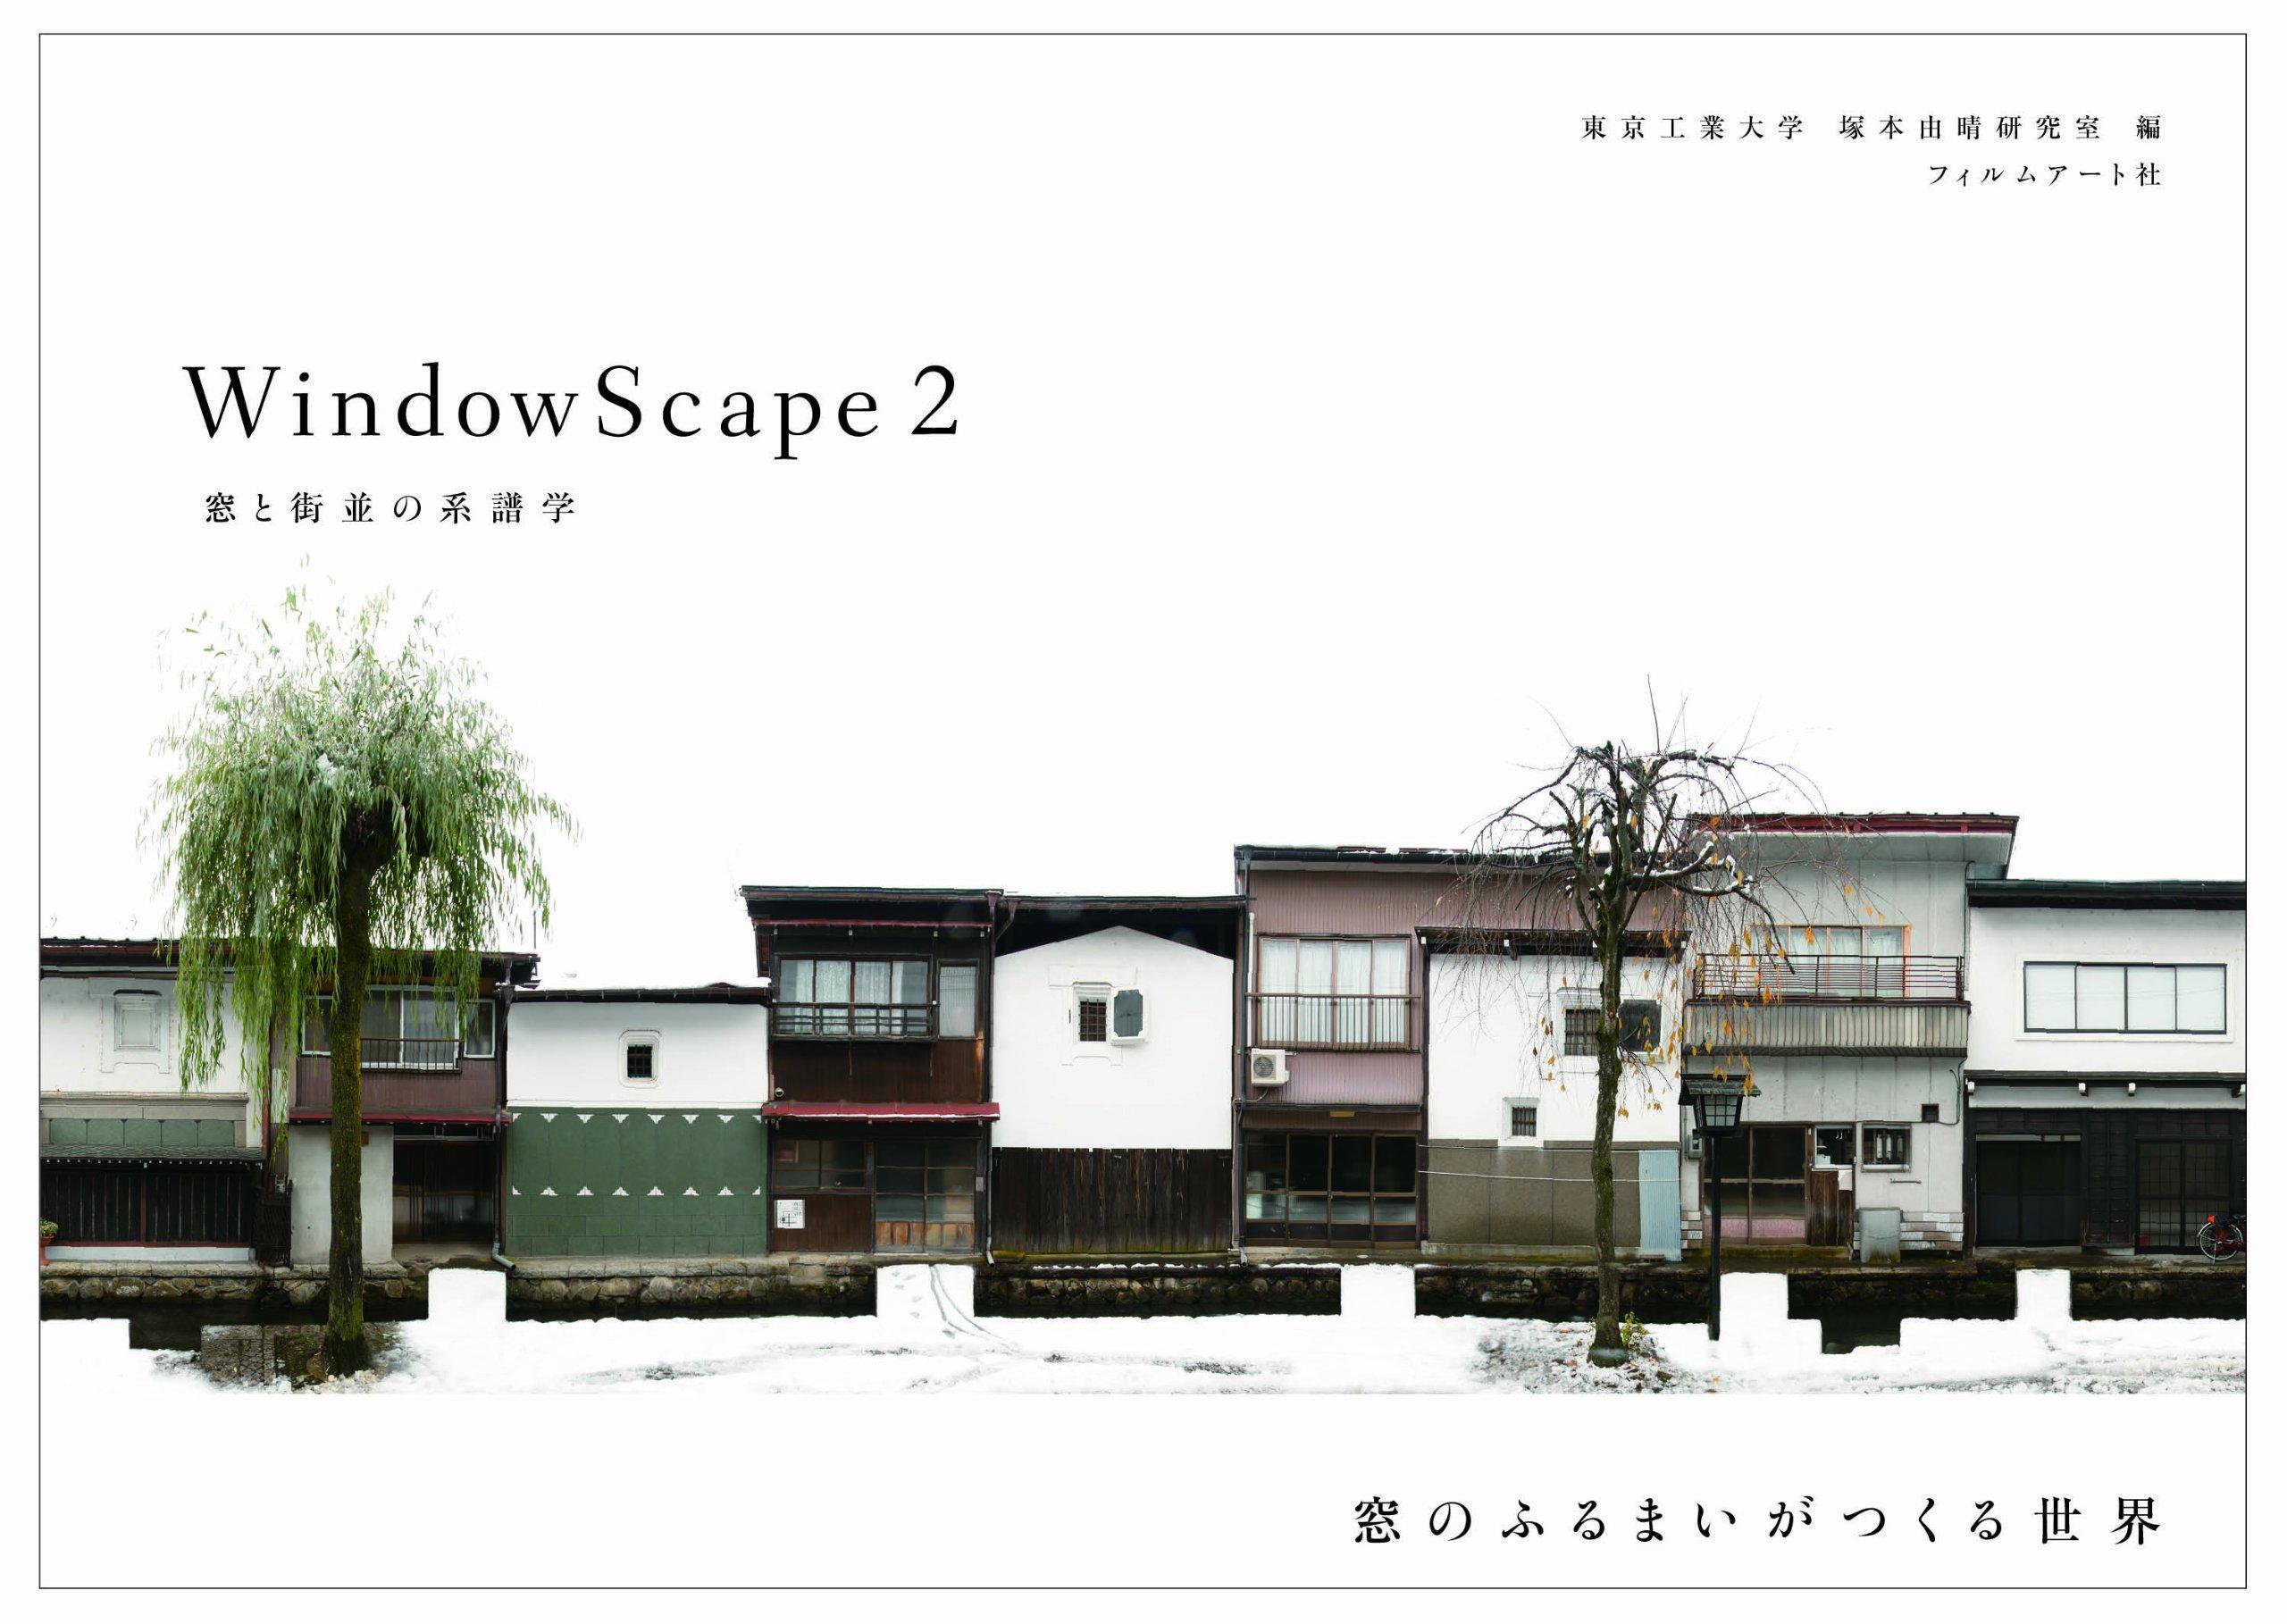 Windowscape 2 (Japanese Edition) PDF